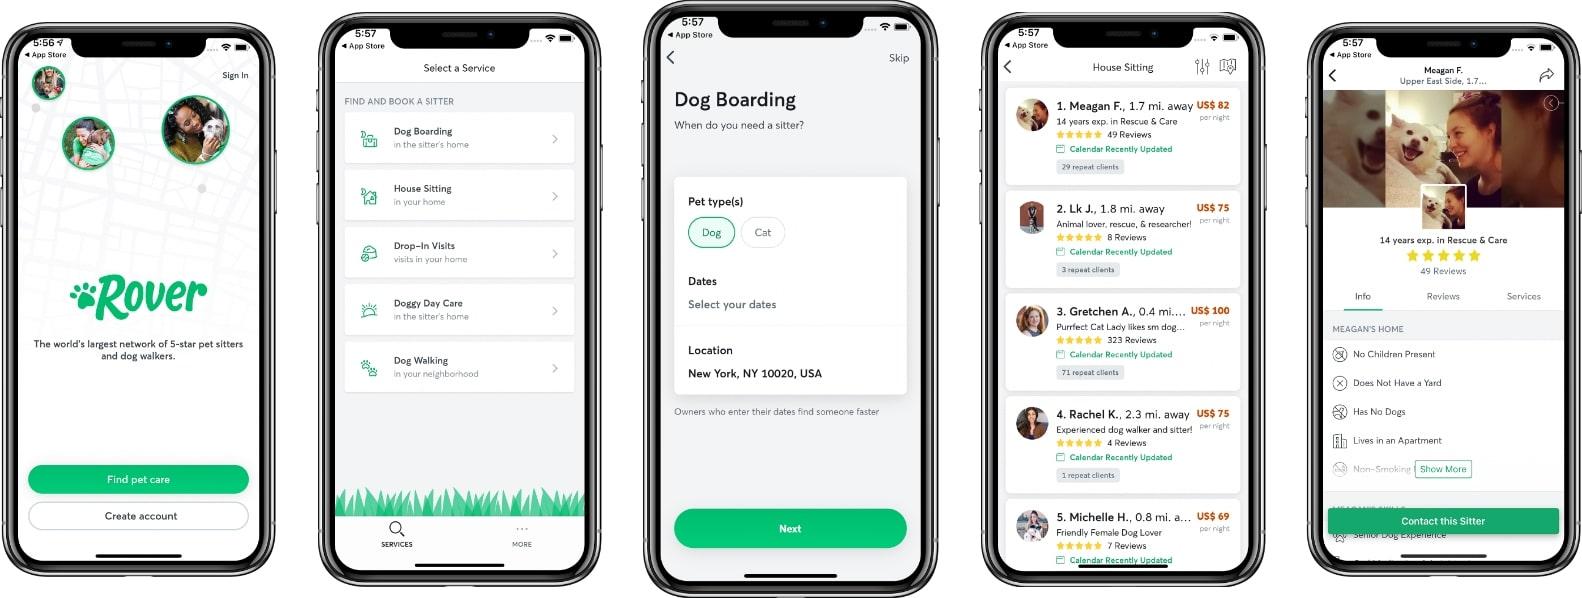 Dog Walking App like Rover